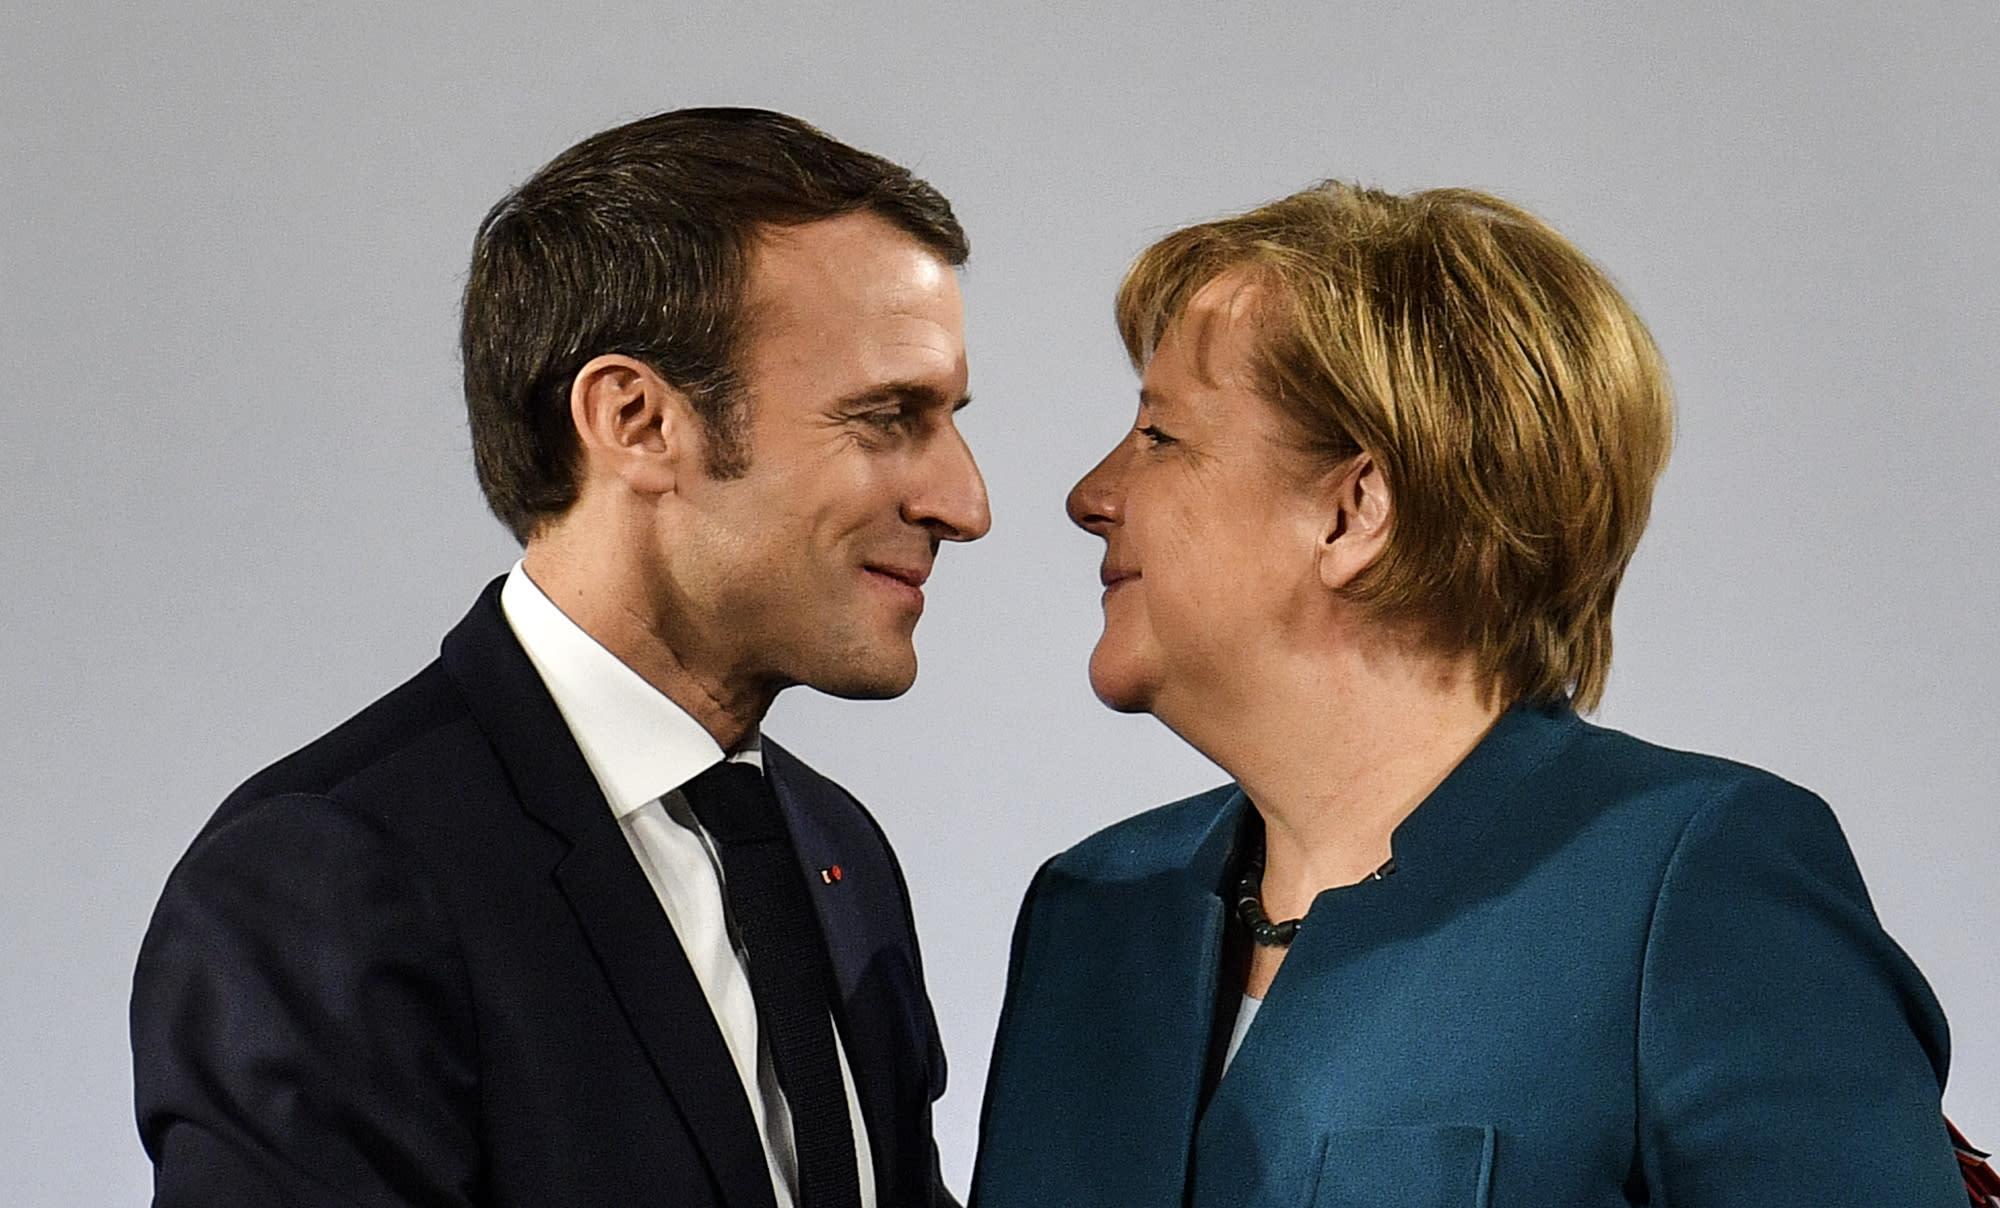 Angela Merkel Topless germany, france renew friendship treaty, warn of nationalism